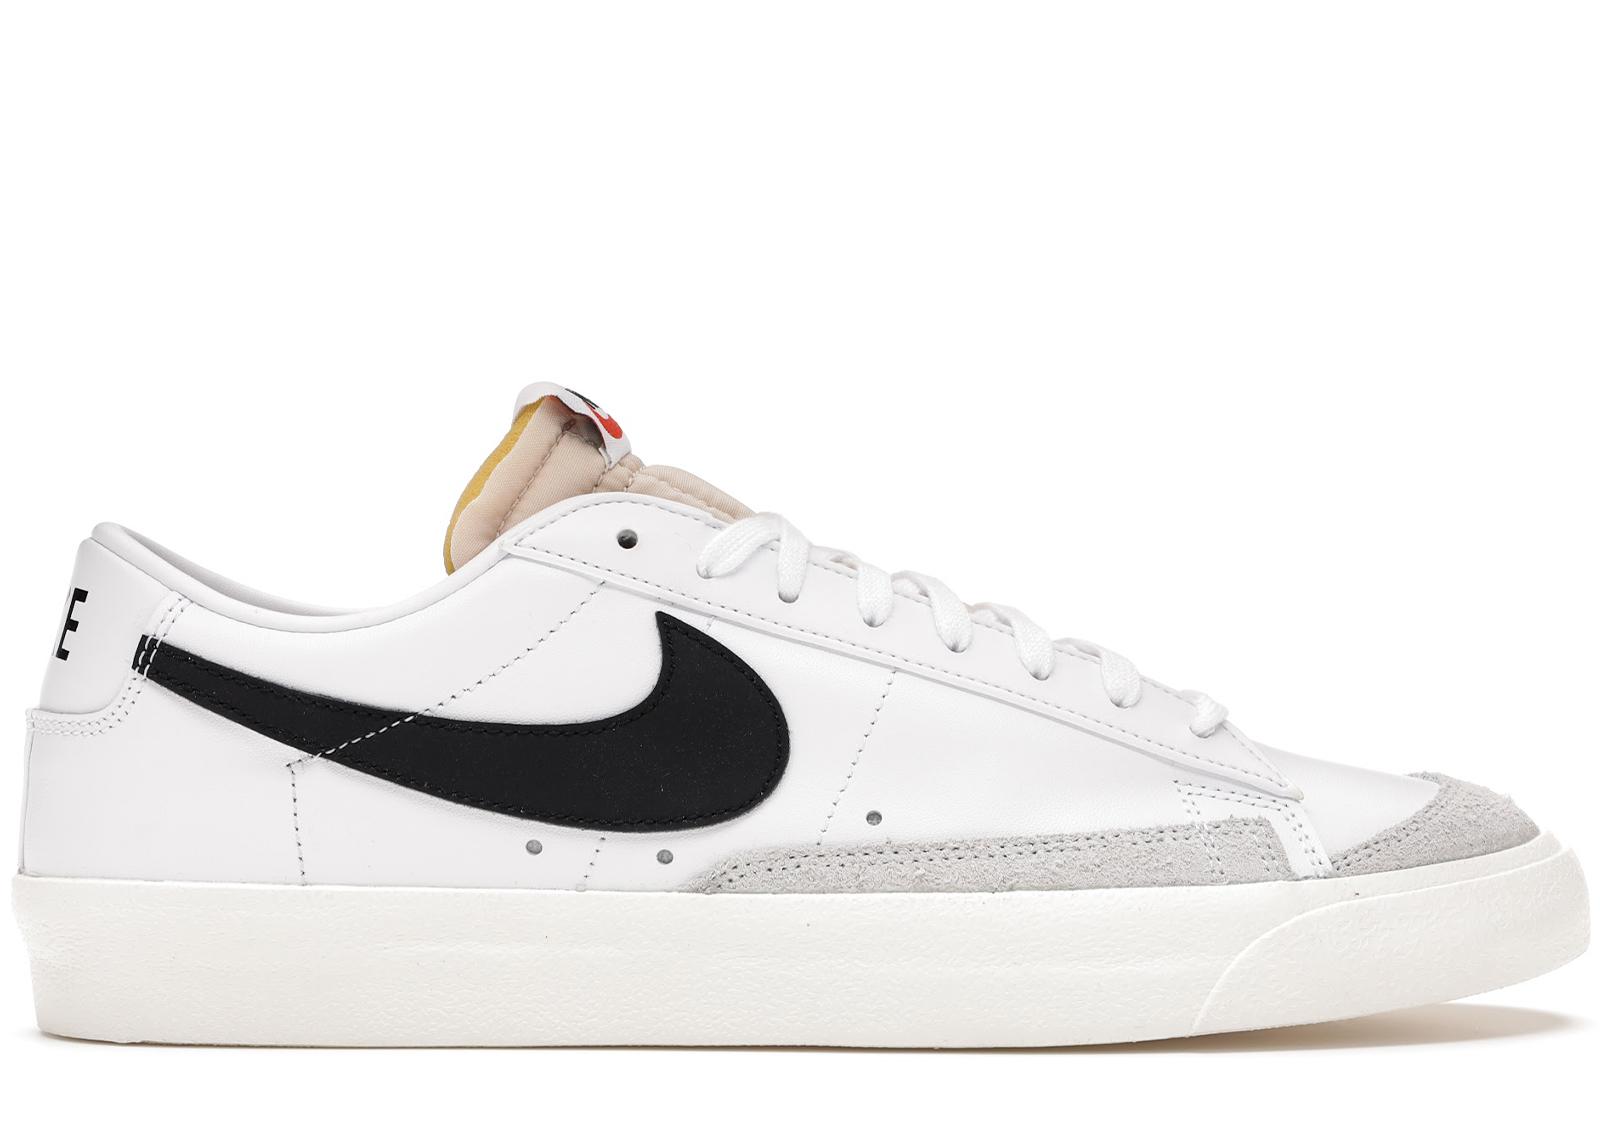 Nike Blazer Low 77 Vintage White Black - DA6464-101/DA6364-101